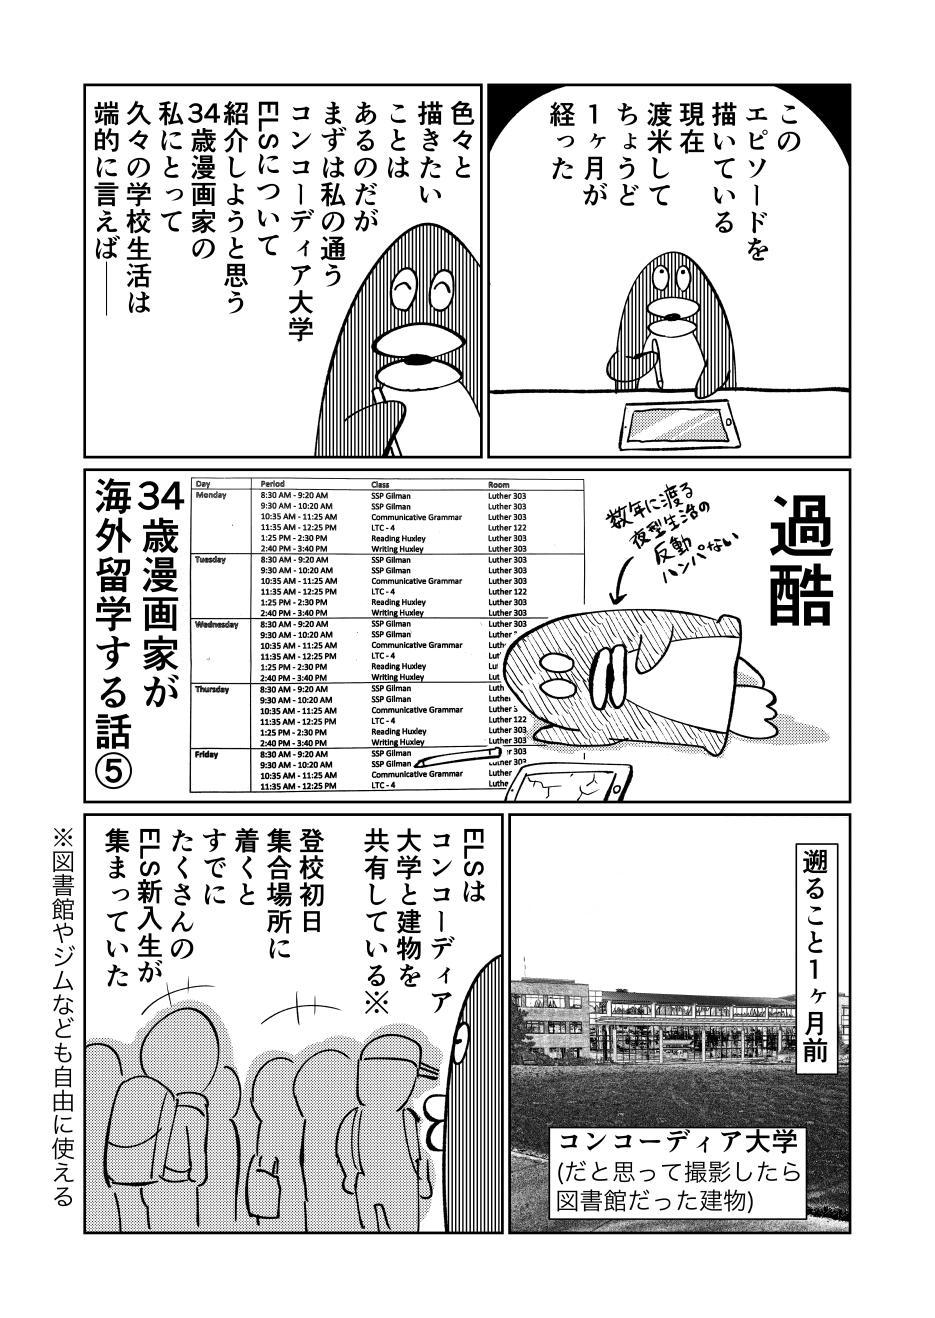 https://www.ryugaku.co.jp/blog/els_portland/upload/ryuugaku5.jpg